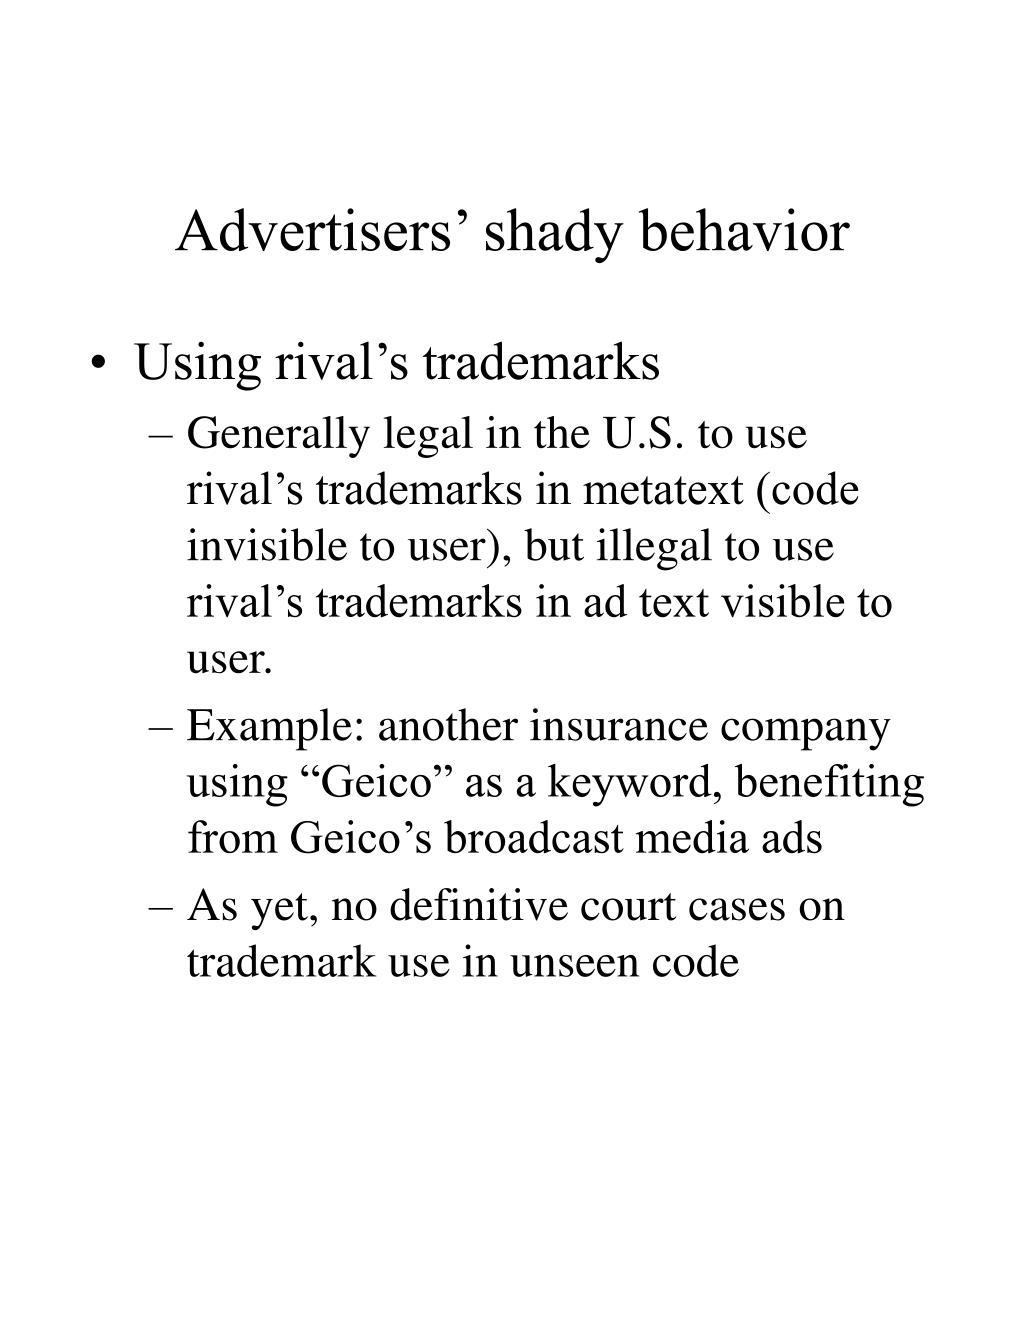 Advertisers' shady behavior